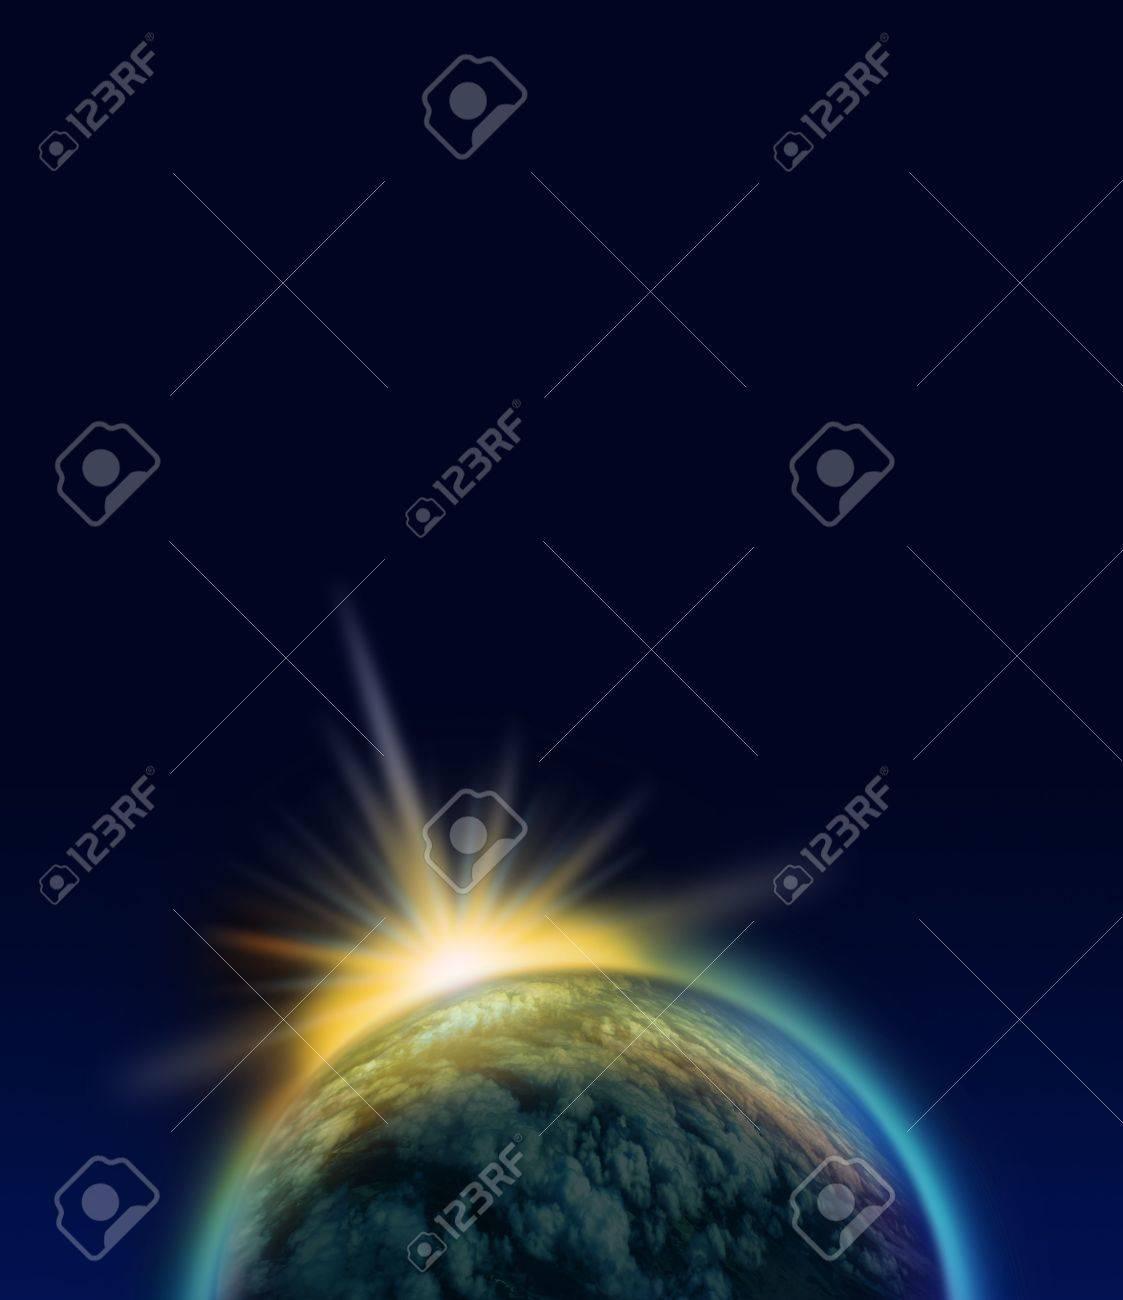 Shining Blue Planet And Bright Light Phenomenon On Dark Space Background Stock Photo